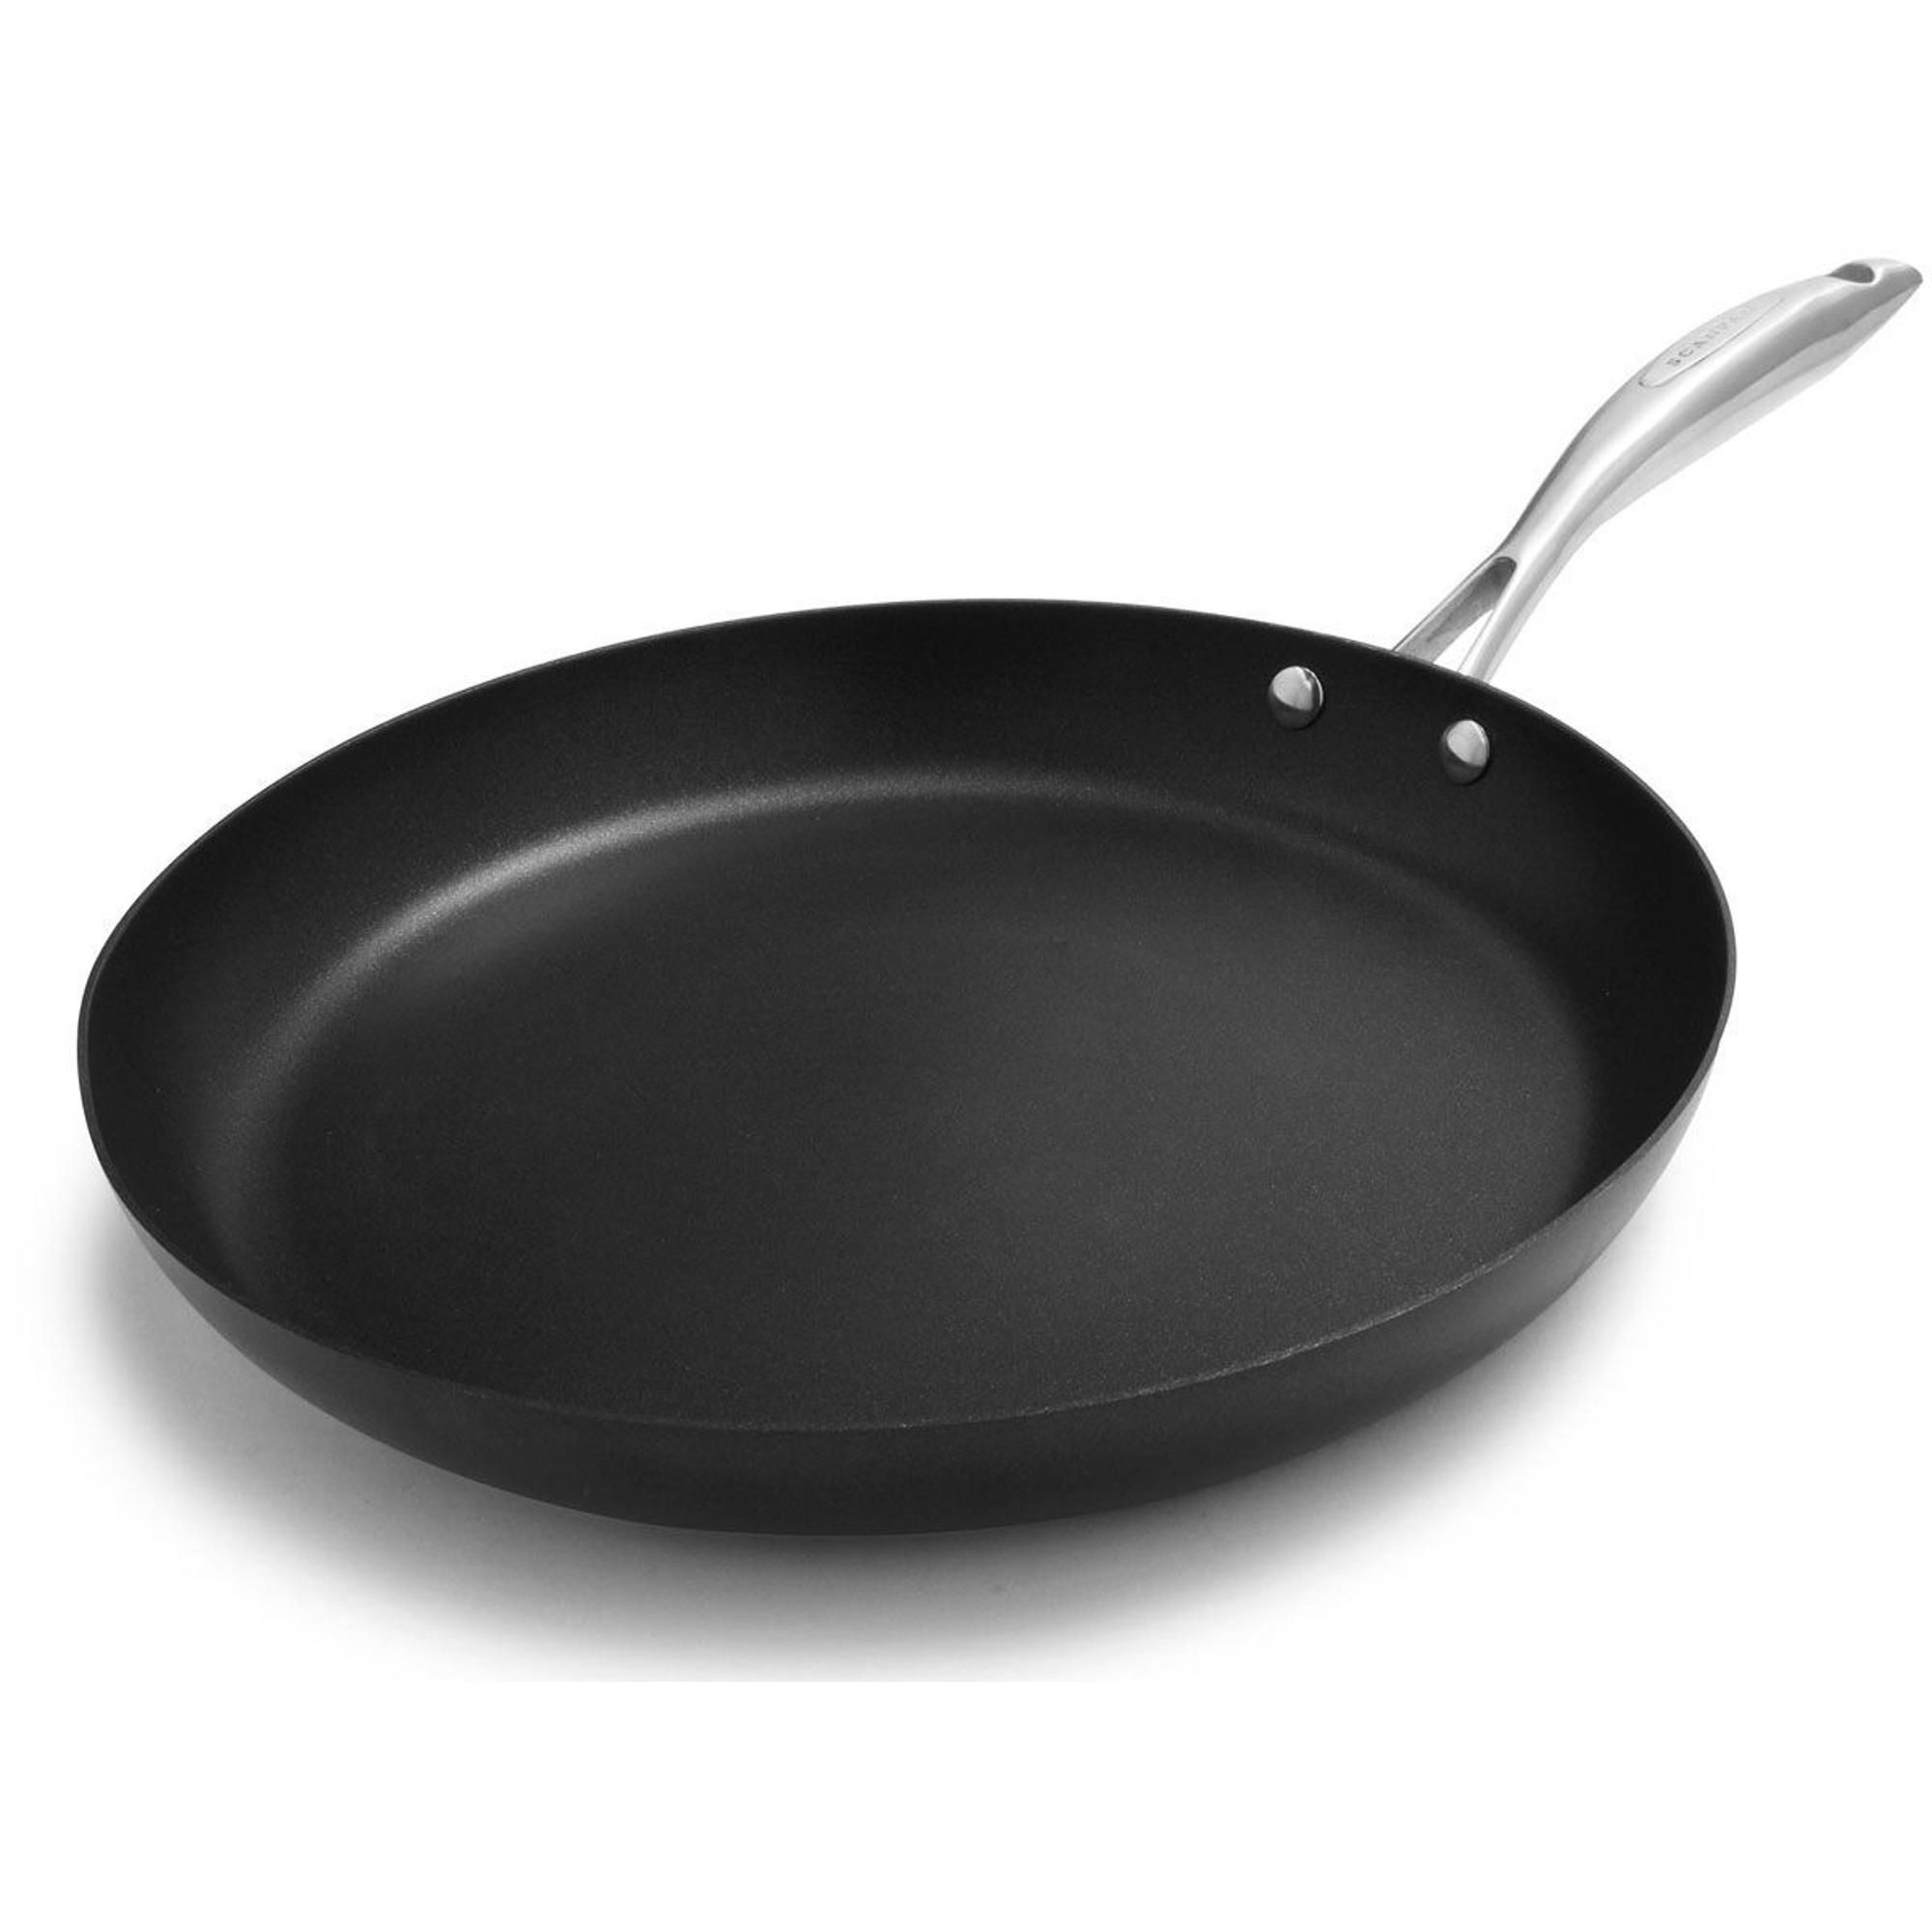 Сковорода Scanpan Pro IQ 32 см сковорода гриль scanpan pro iq 27 см